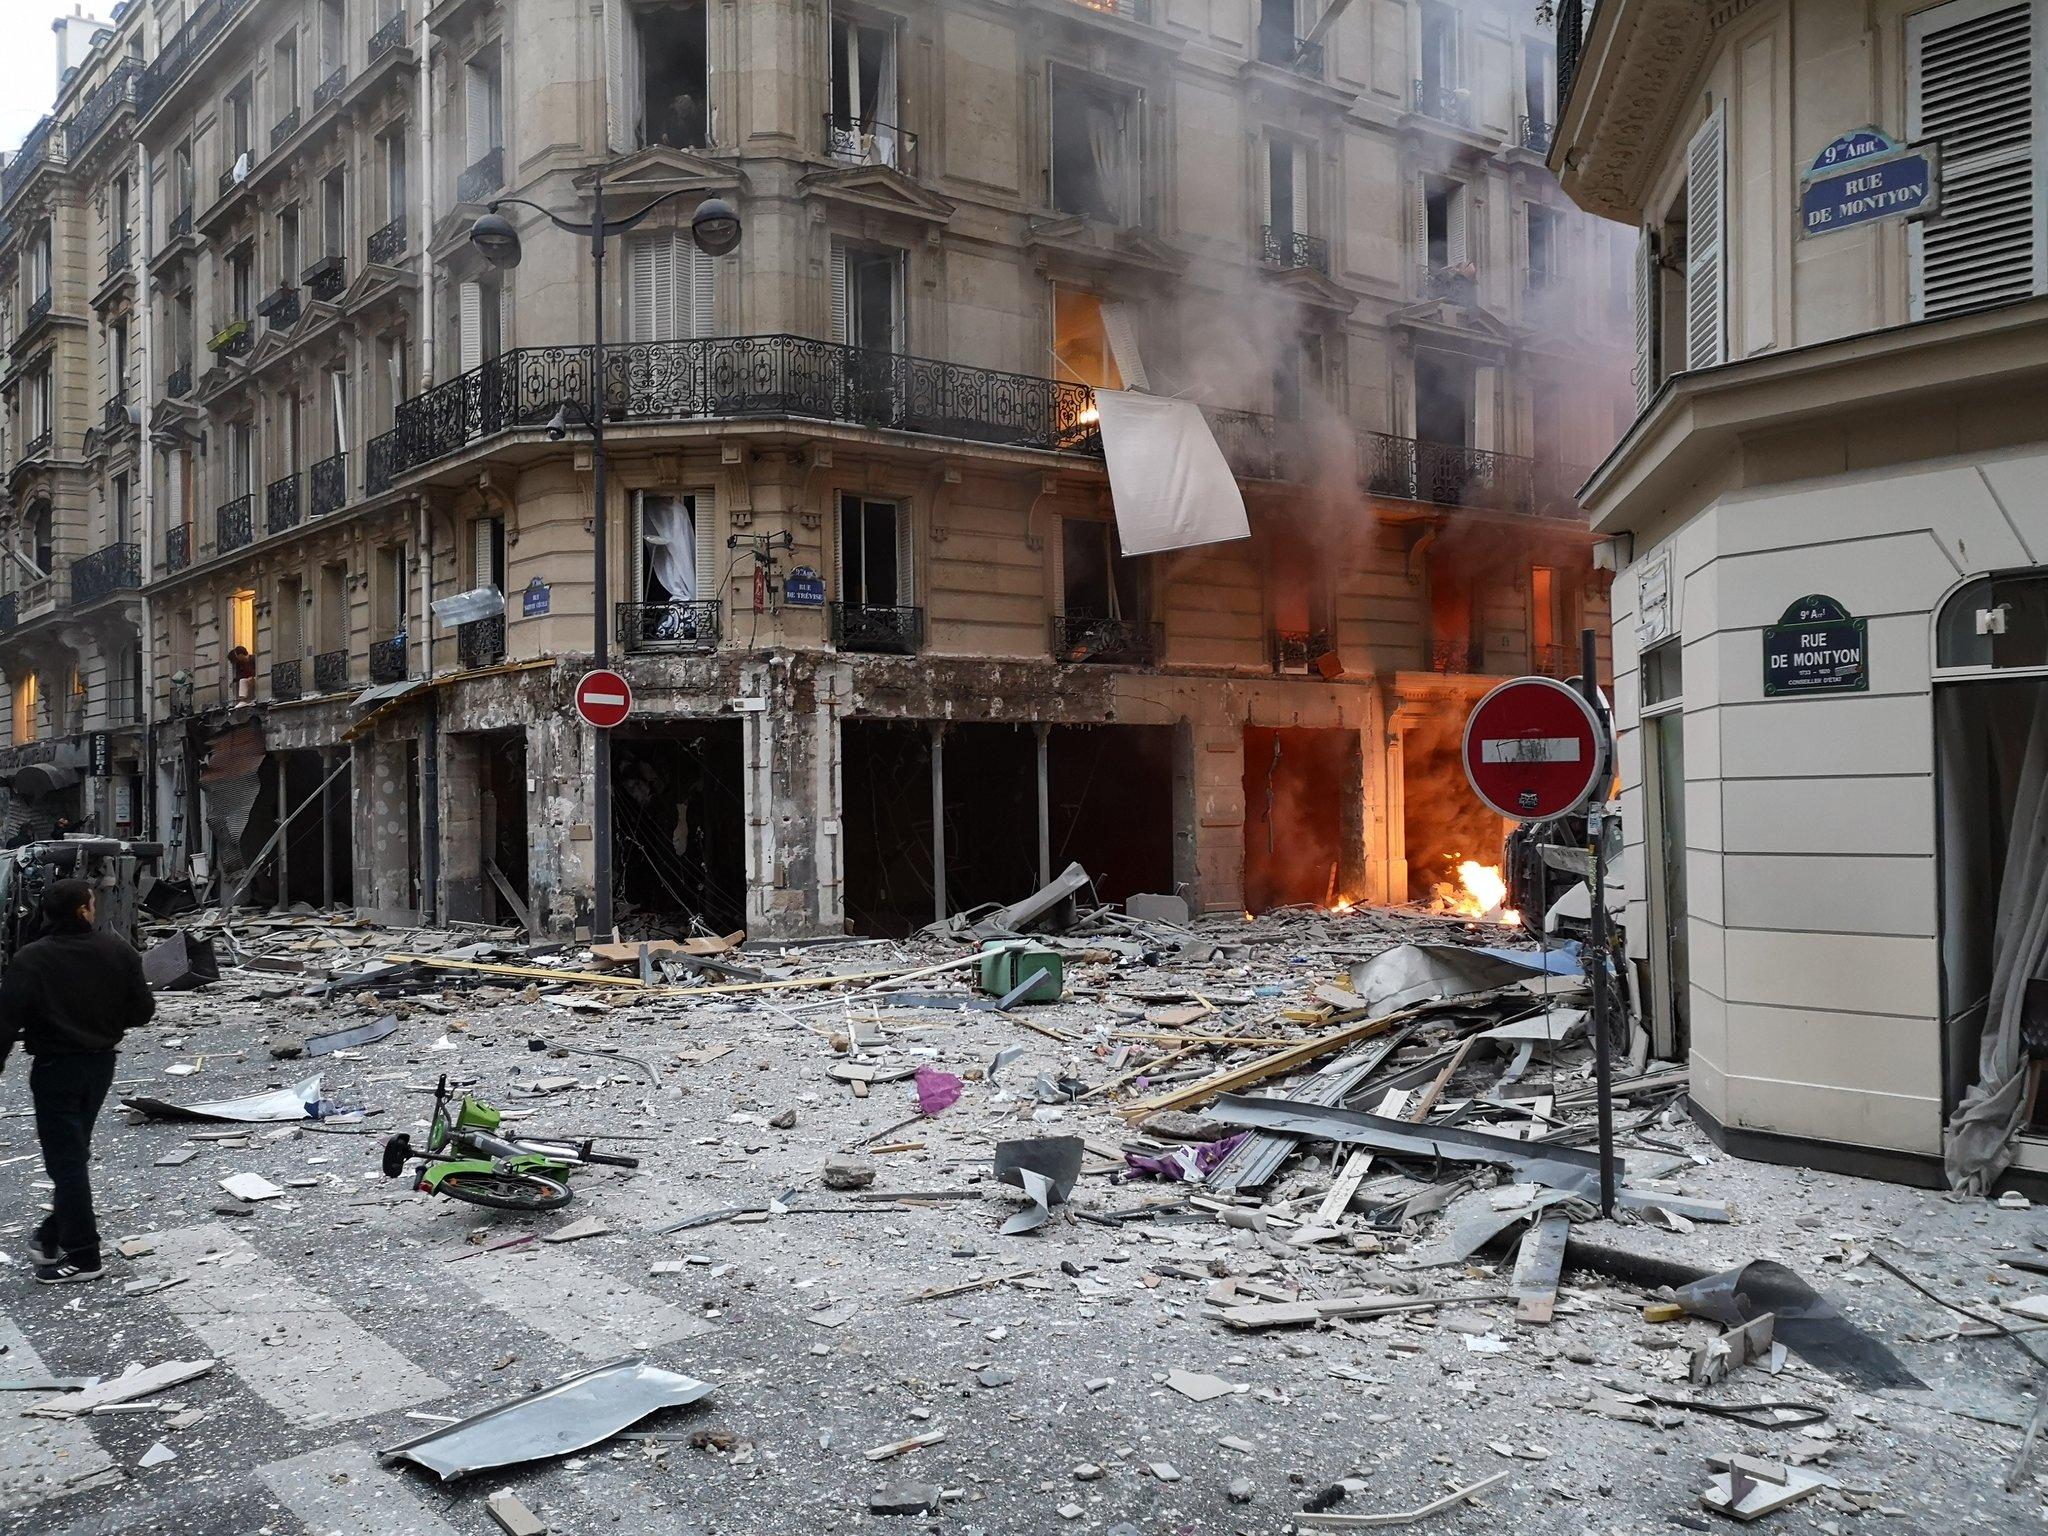 Photo of إصابة عدة أشخاص بانفجار داخل مخبز بالدائرة التاسعة وسط باريس